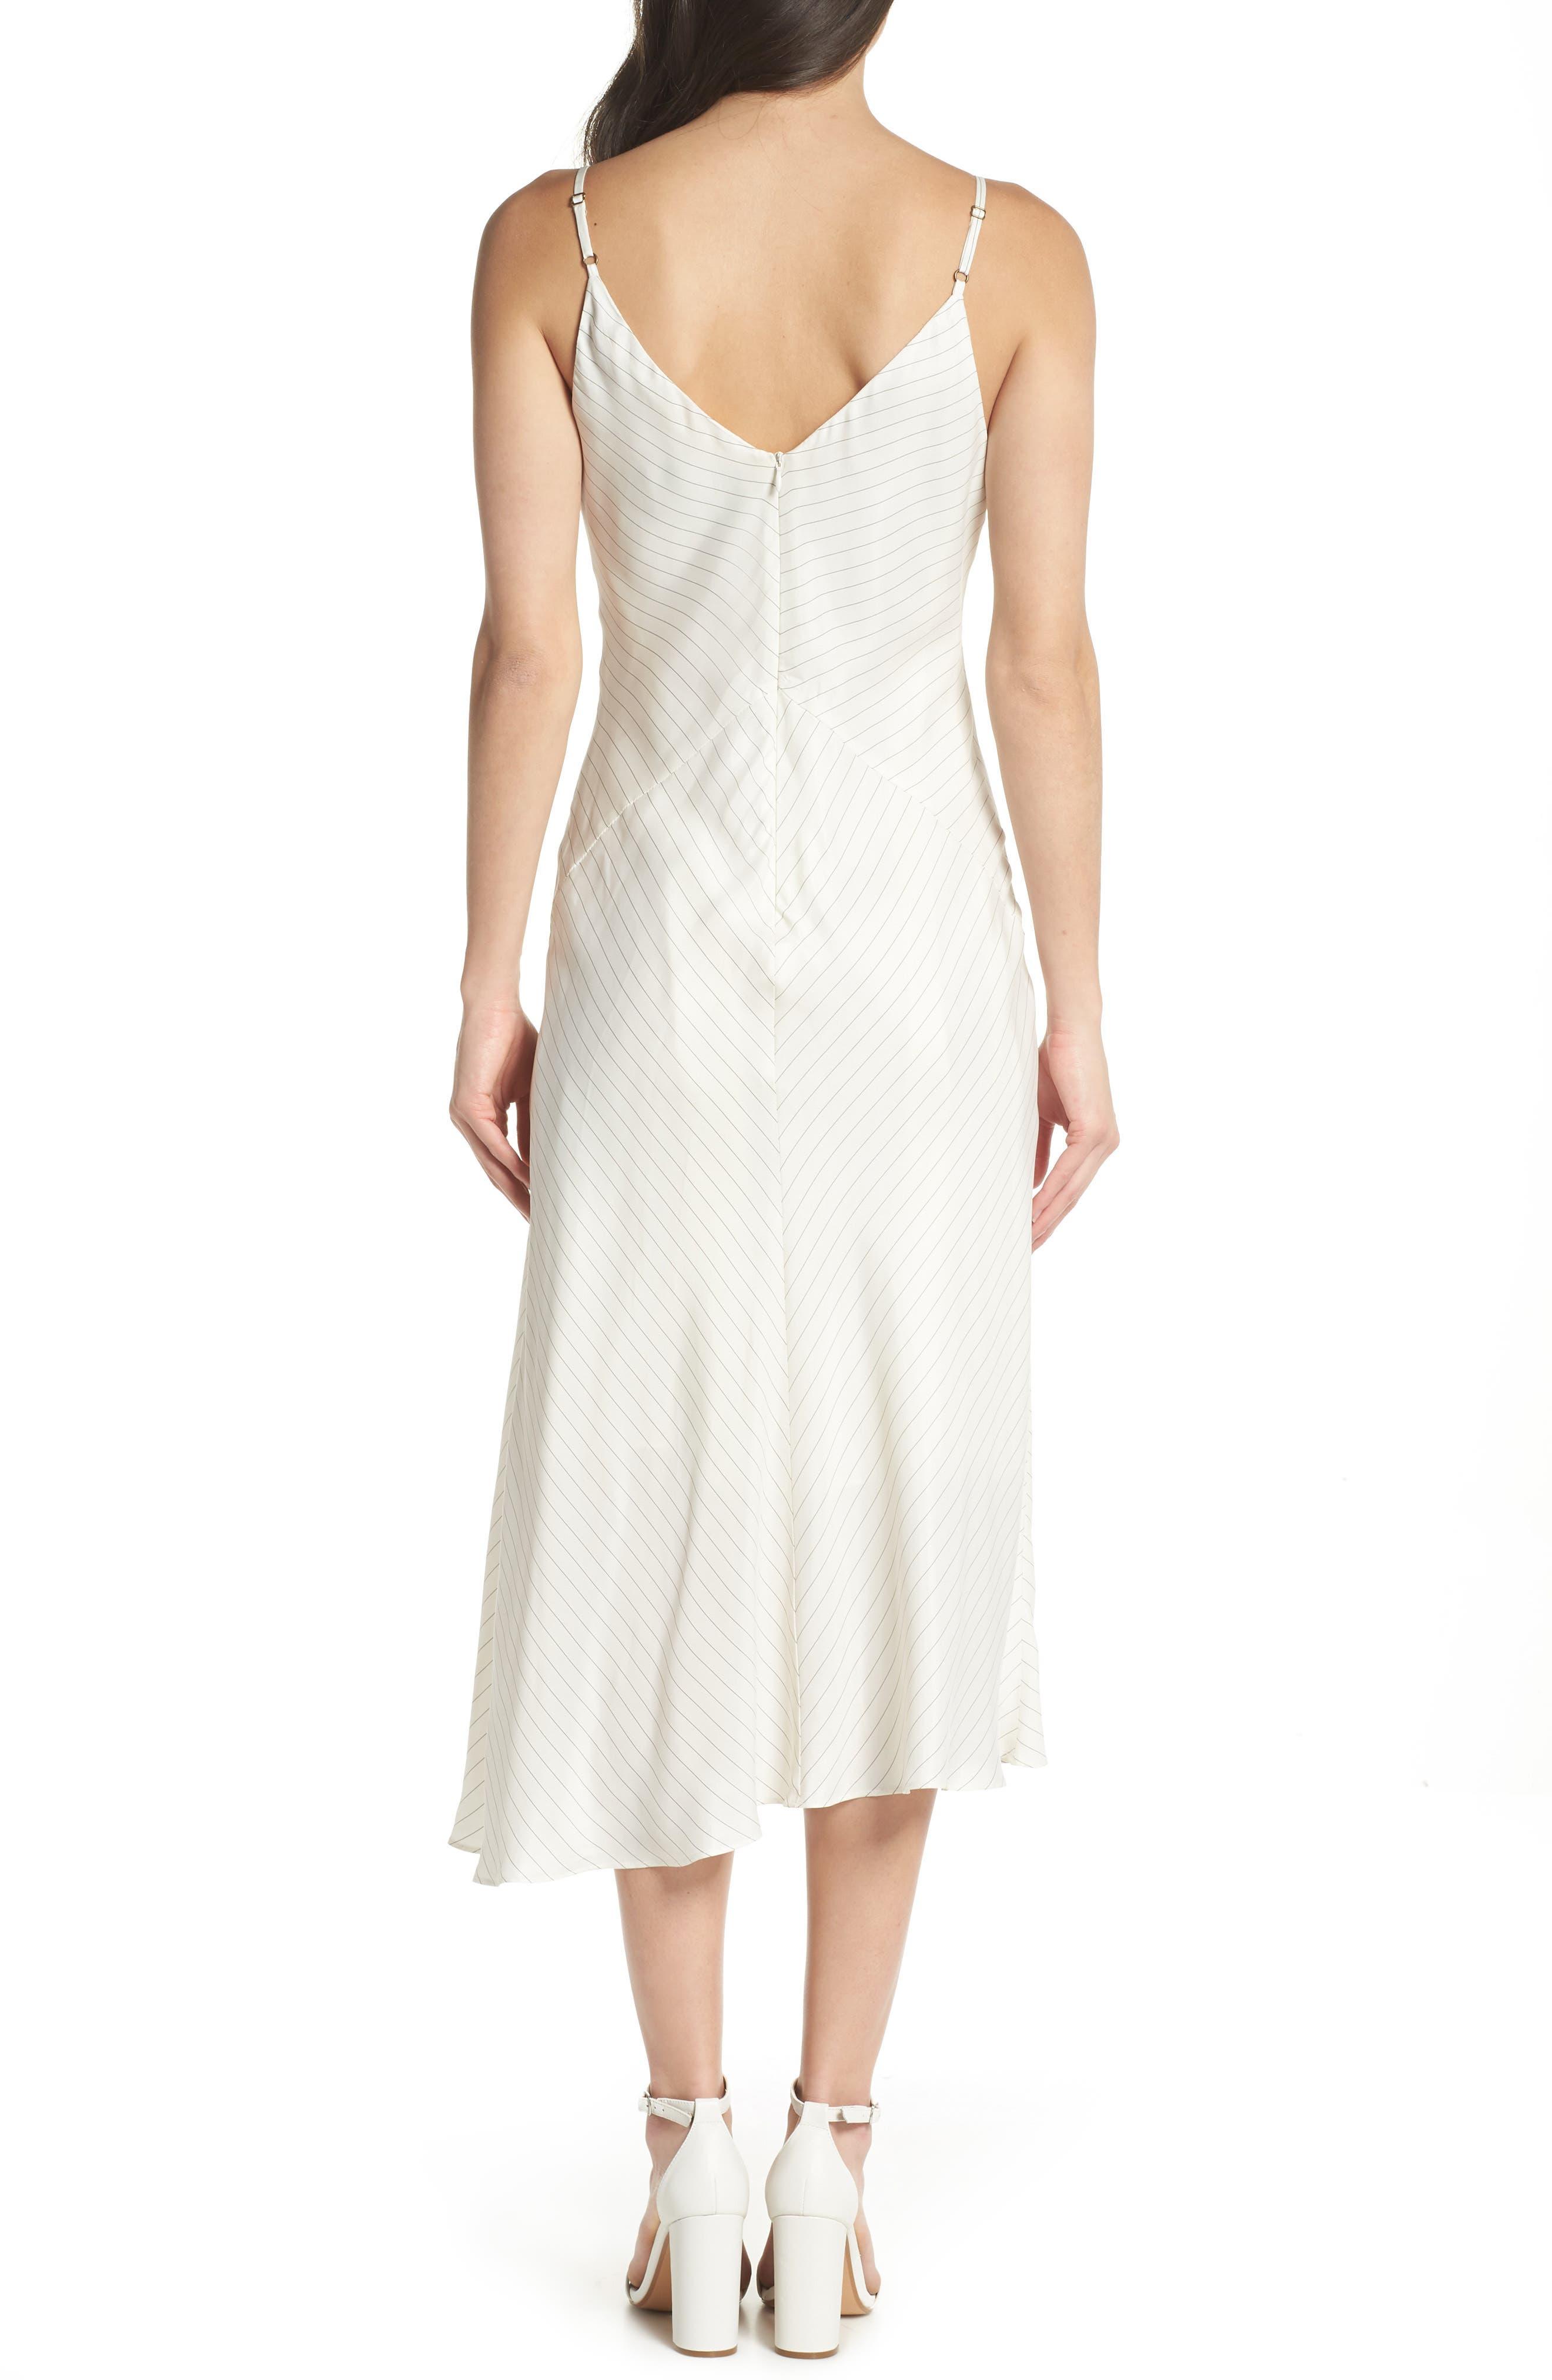 Bay Area Pinstripe Asymmetric Midi Dress,                             Alternate thumbnail 2, color,                             Cream